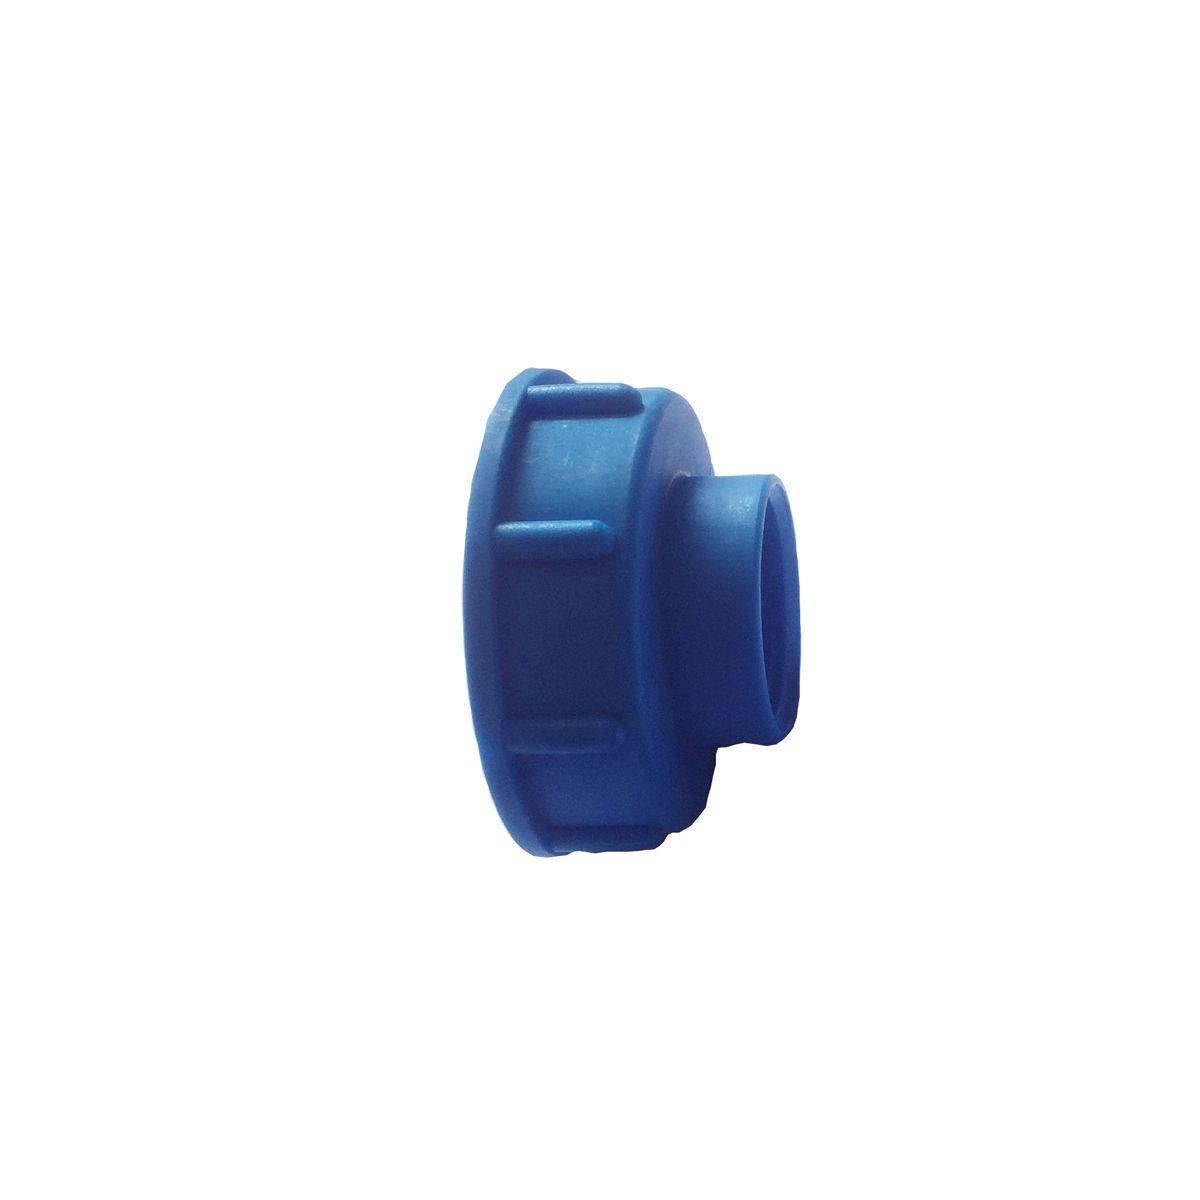 Adapter IG zu IBC Container, aus Kunststoff, blau, S60 x 6 IG, 1' IG